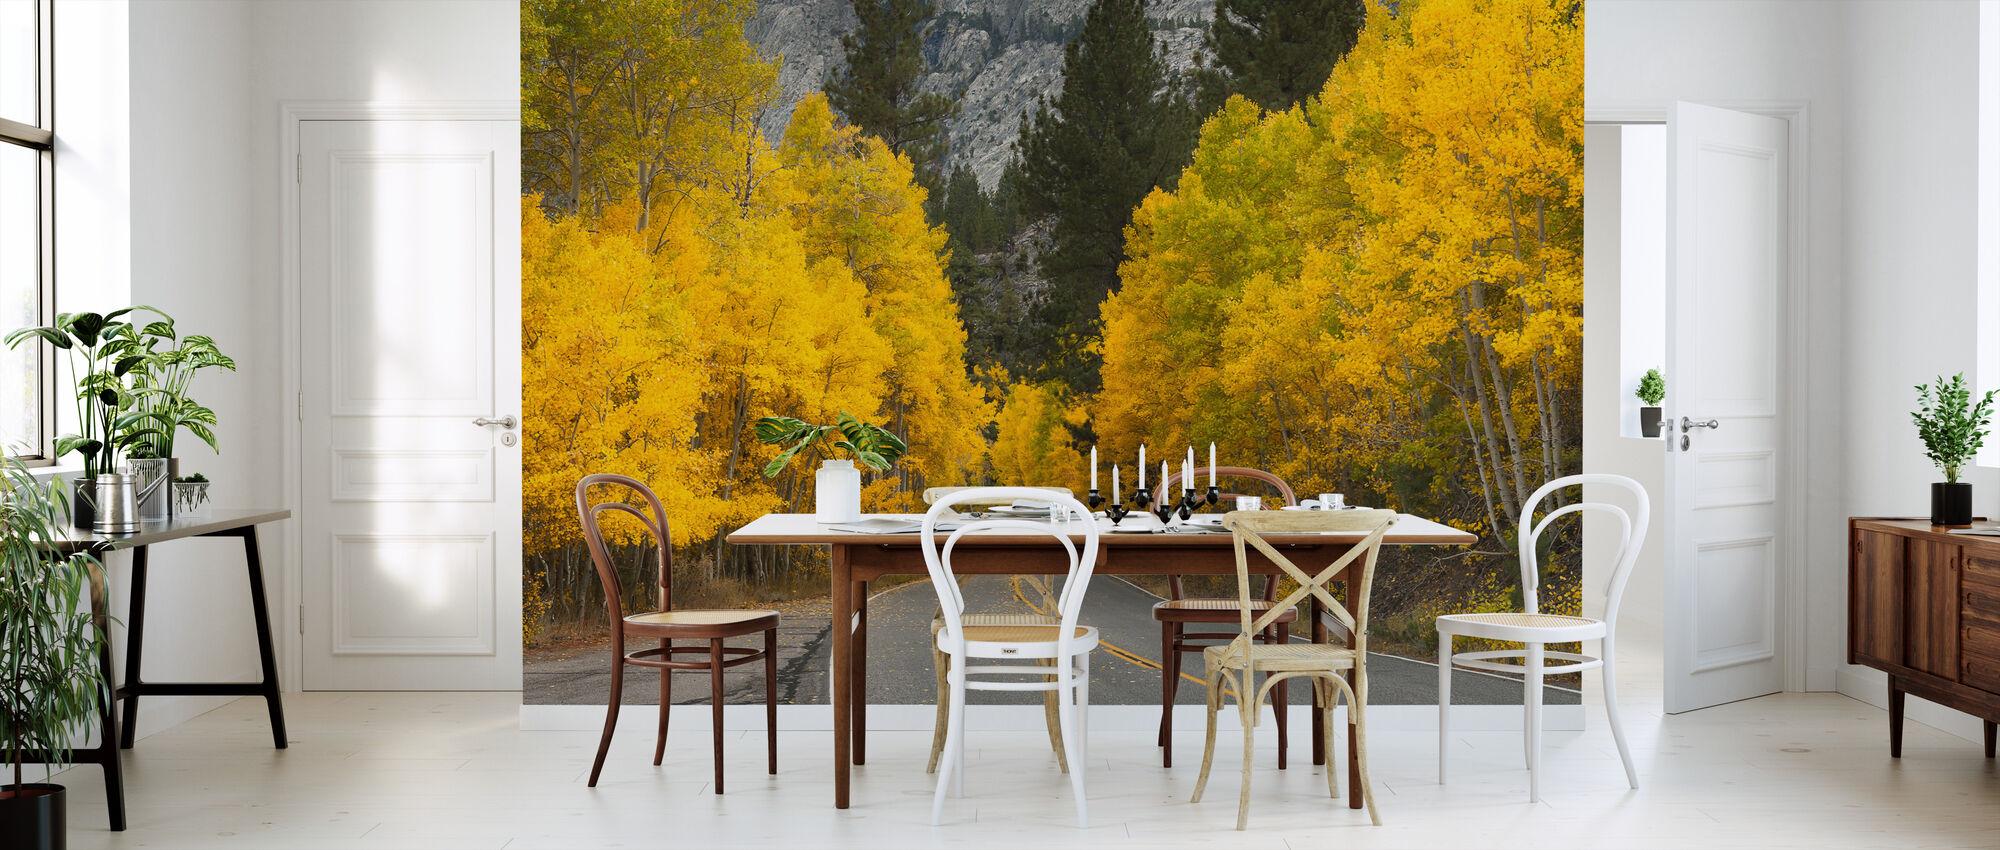 Eastern Sierra Autumn Landscape - Wallpaper - Kitchen